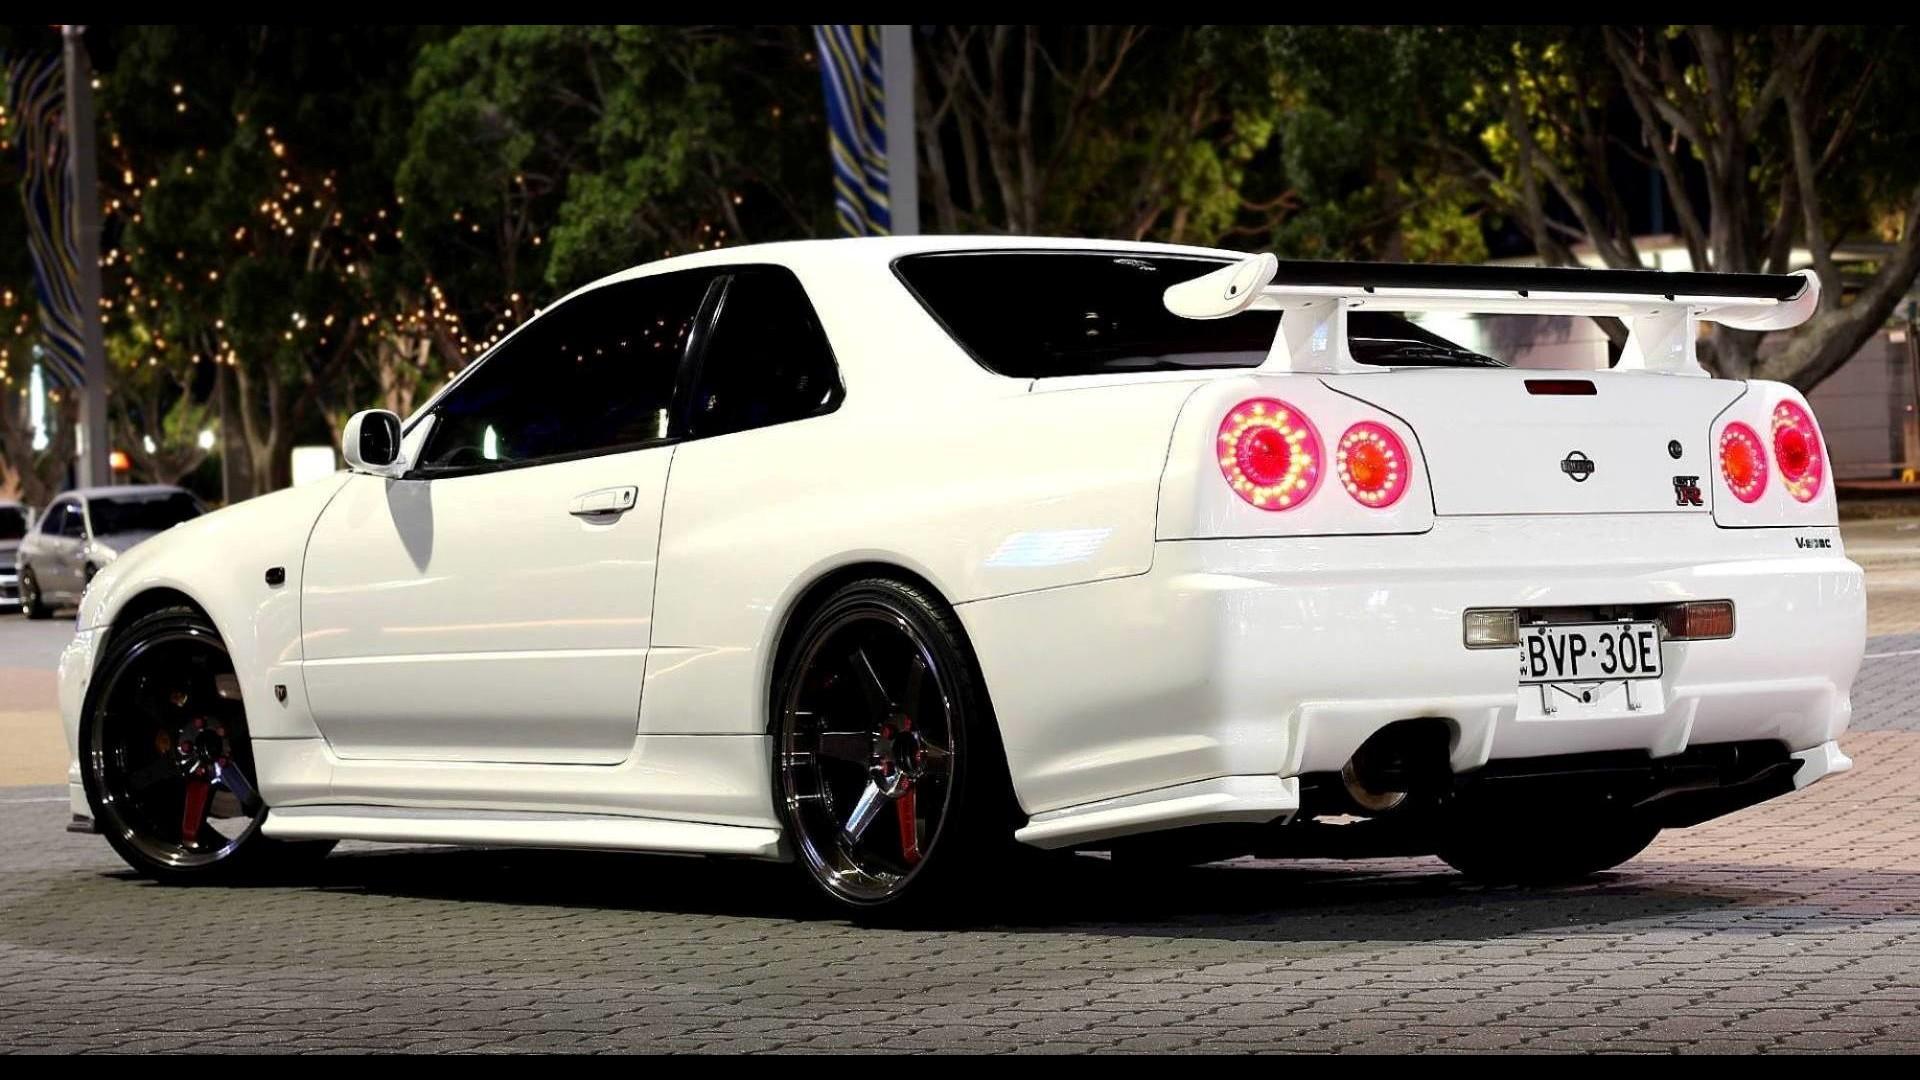 Wallpaper JDM Sports Car Nissan Skyline GT R R34 Performance Sedan V Spec II Wheel Rim Supercar